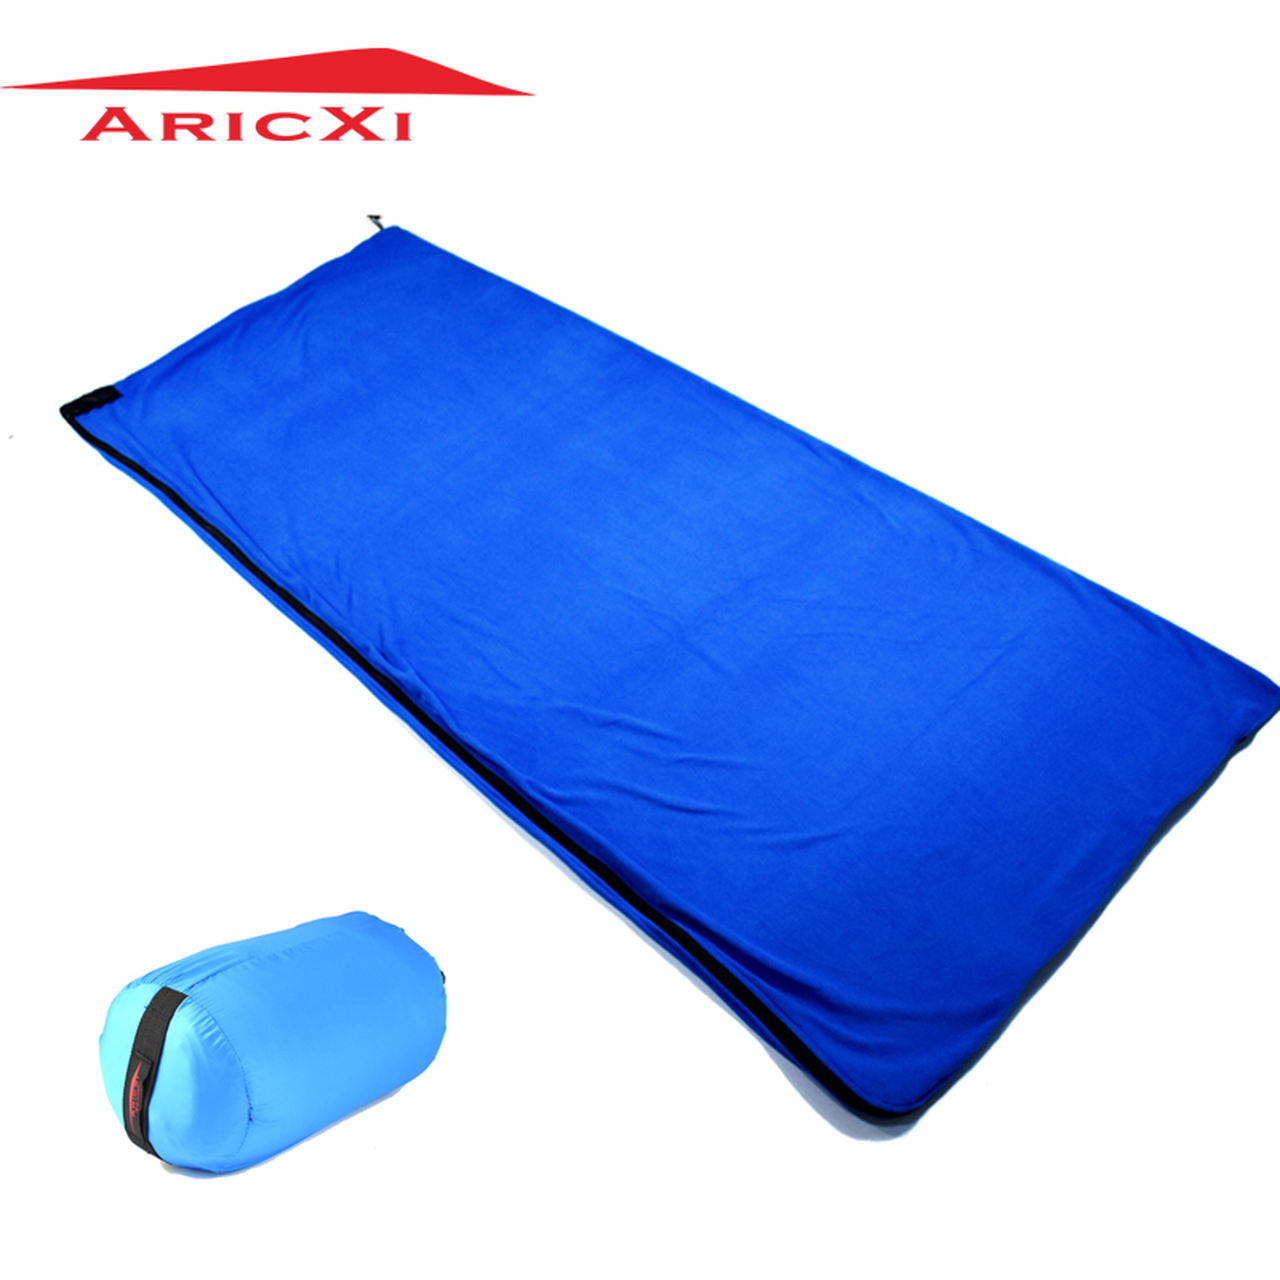 Ultra-light Multifuntion Polar Fleece Sleeping Bag Portable Outdoor Camping  Travel Spring and Winter Warm Sleeping Bag Liner - OnshopDeals.Com f4a53957c